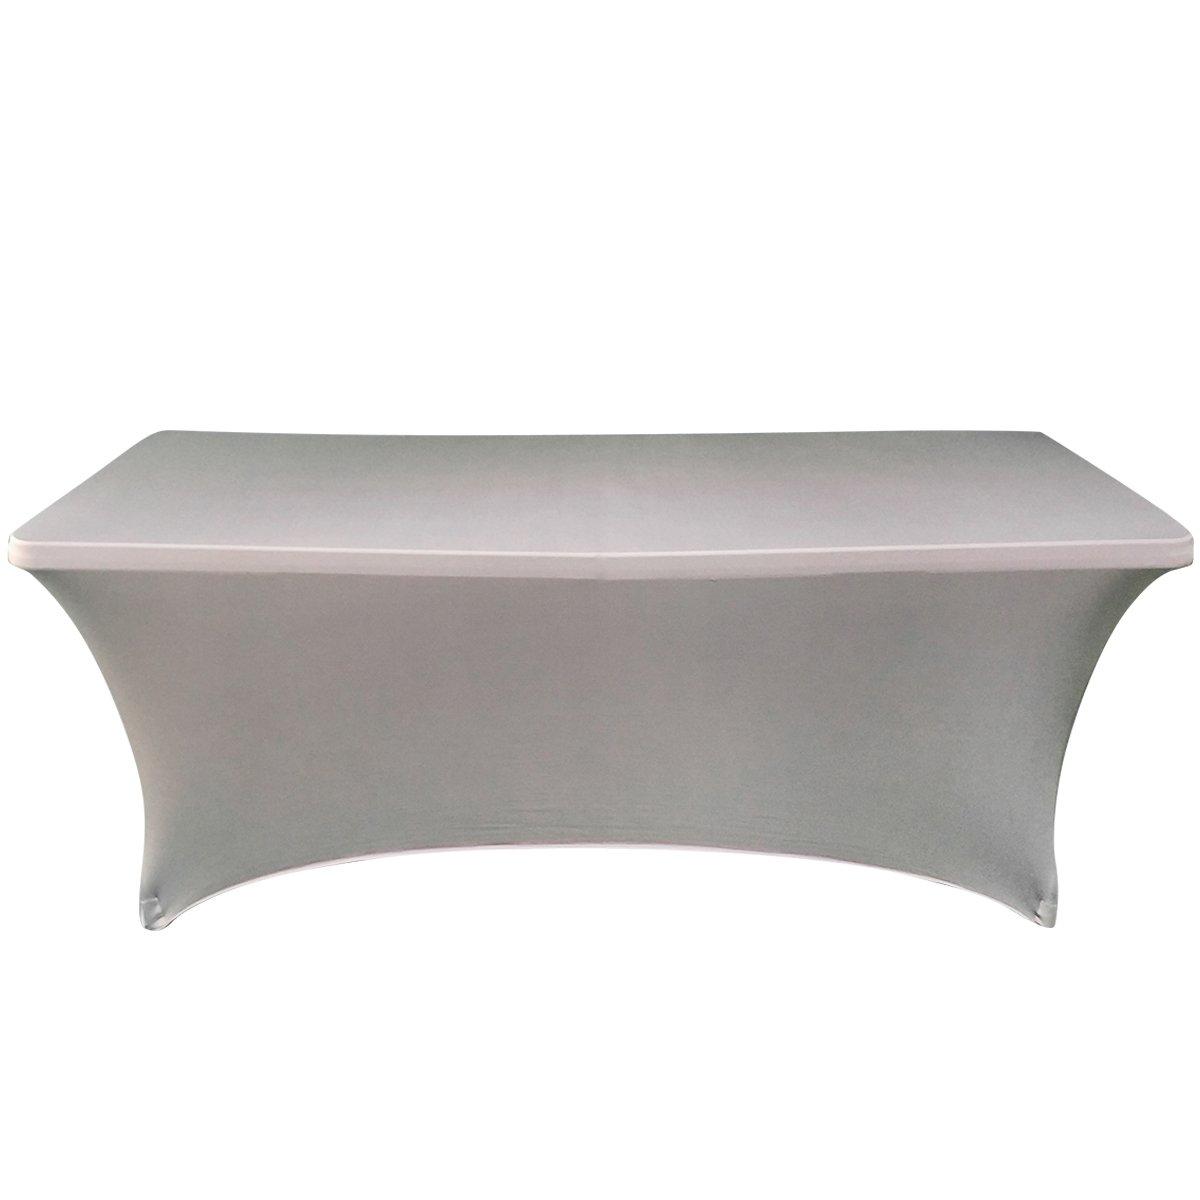 Ebeta Coperture per tavoli, rettangolare Copritavolo, Coperture per tavoli da birra  copertura estensibile 183*76*76 cm (Grigio)